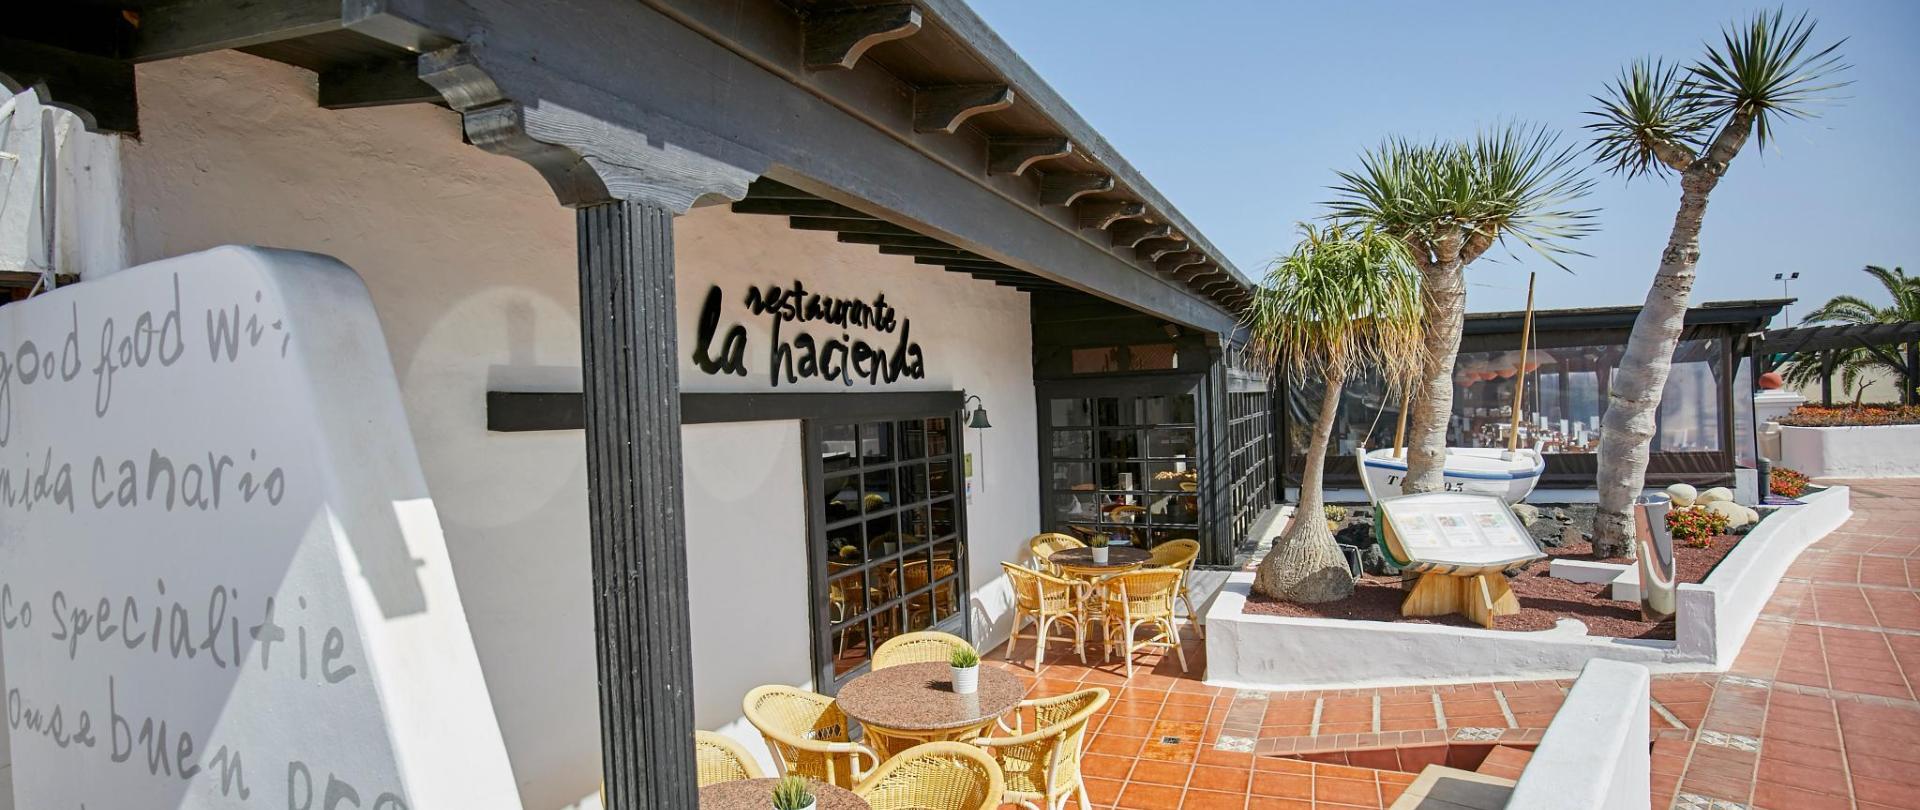 Best meals at La Hacienda Restaurant.jpg